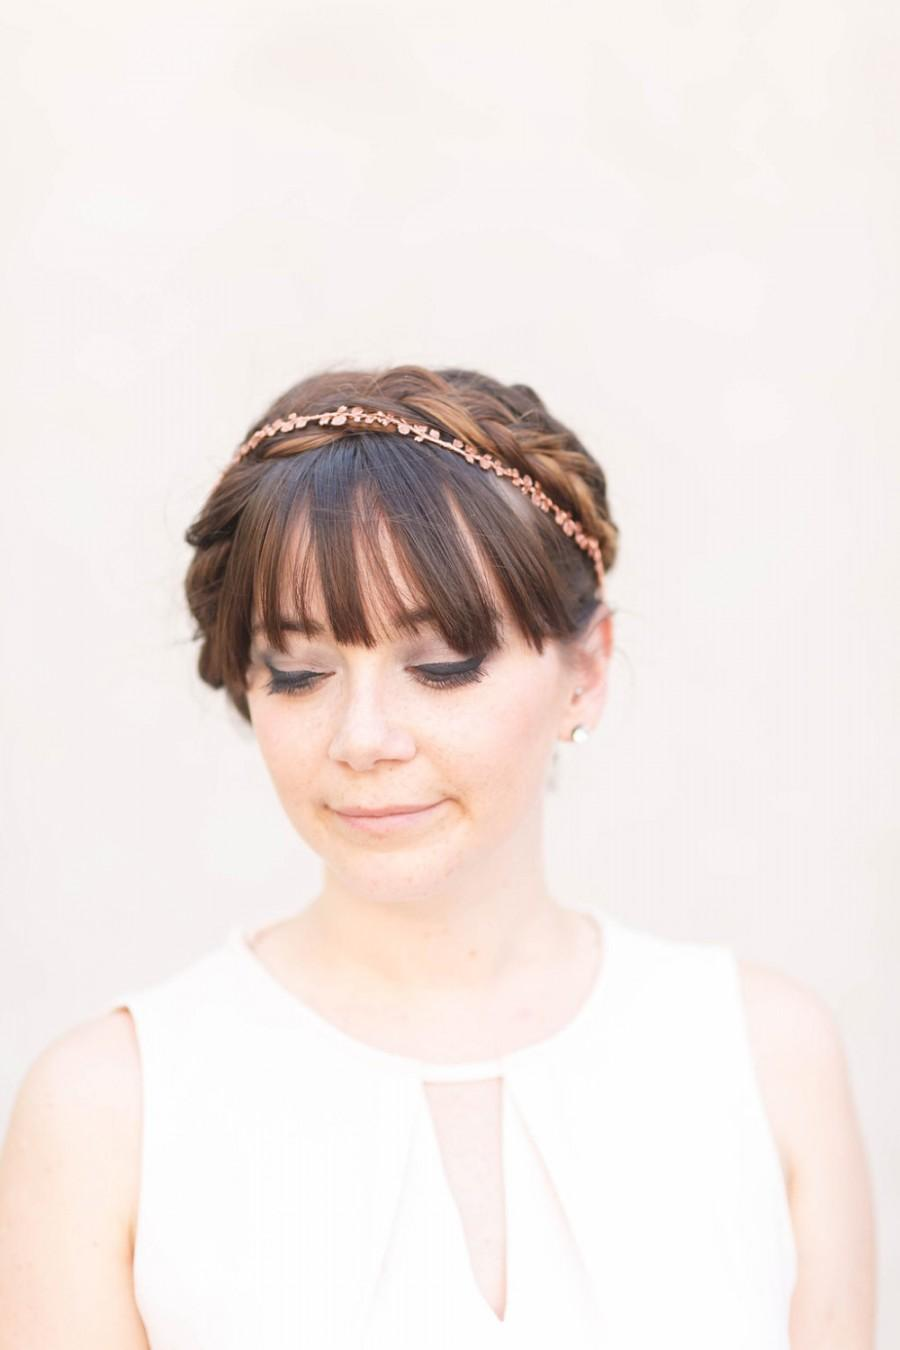 Wedding - The Rose Vine - Simple Golden or Rose Gold Brass Floral Crown, headband, halo, Boho